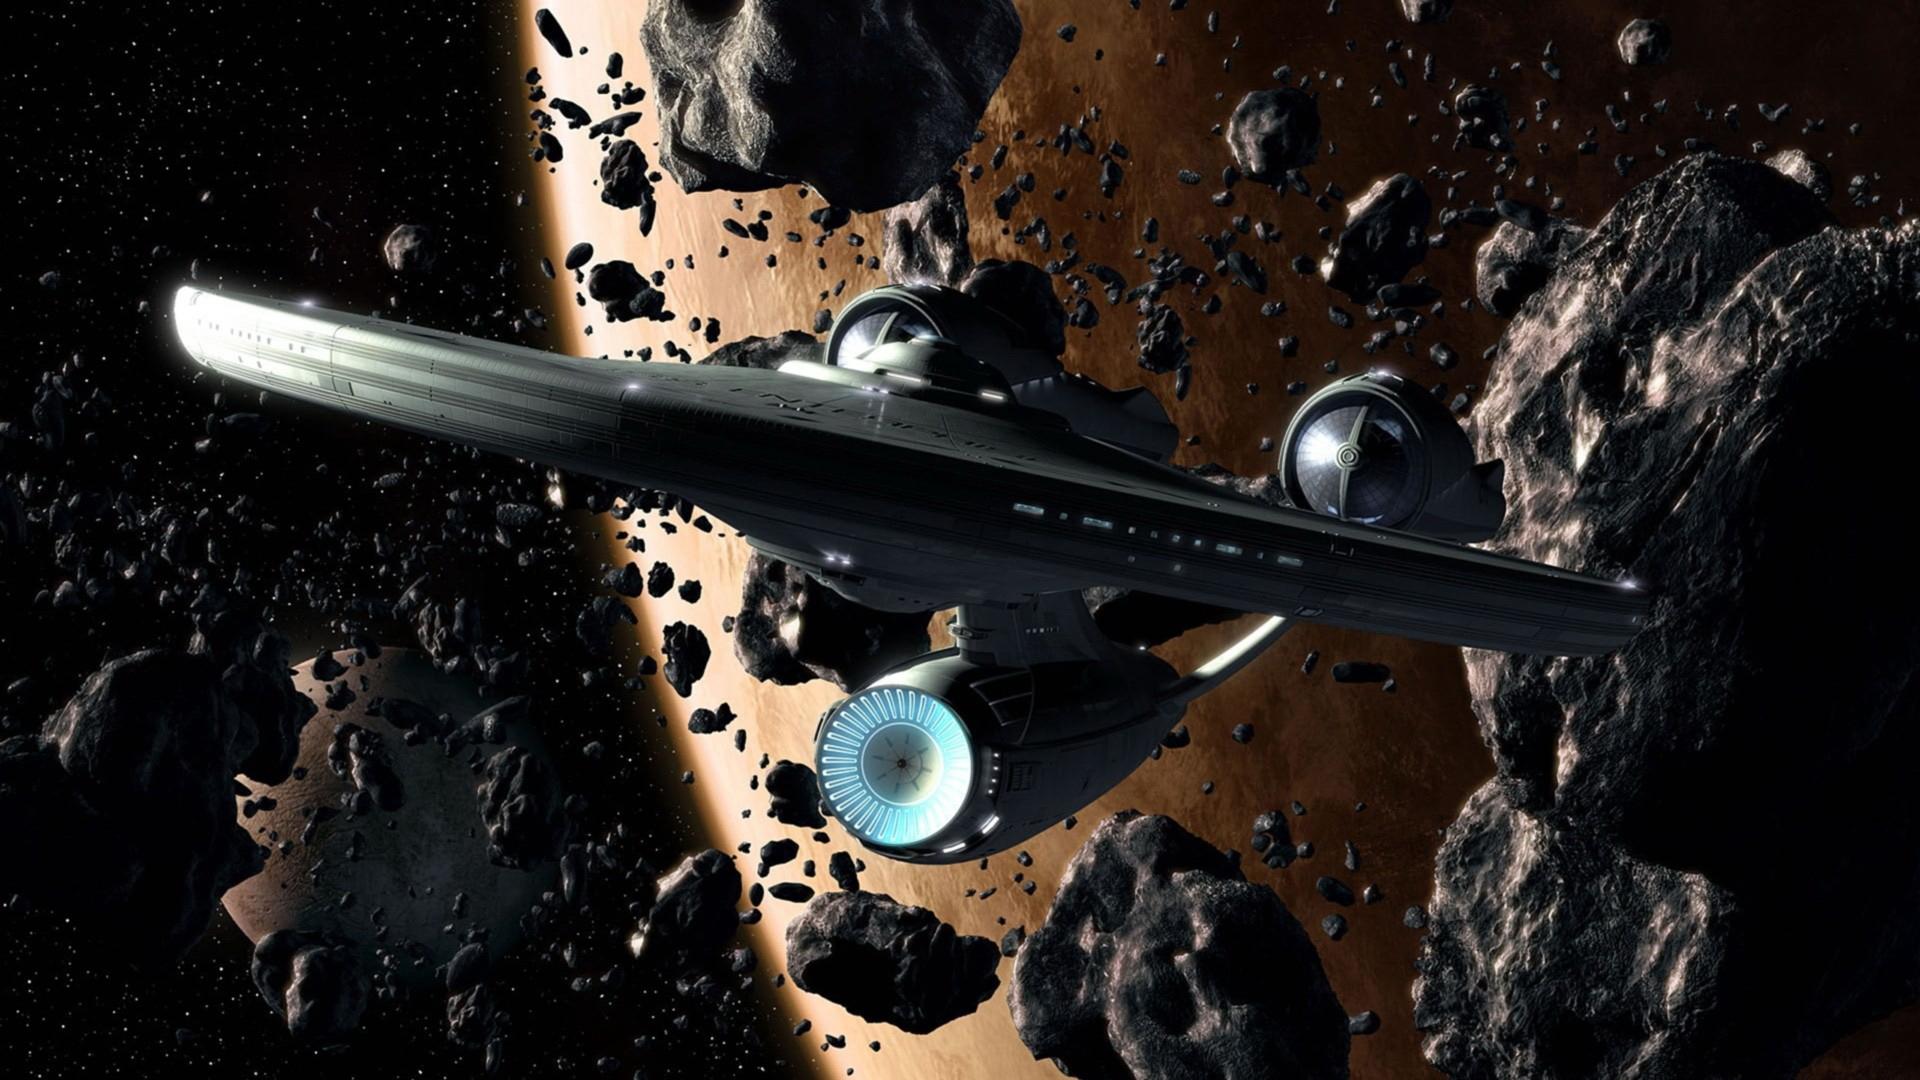 sci fi star trek wallpaper